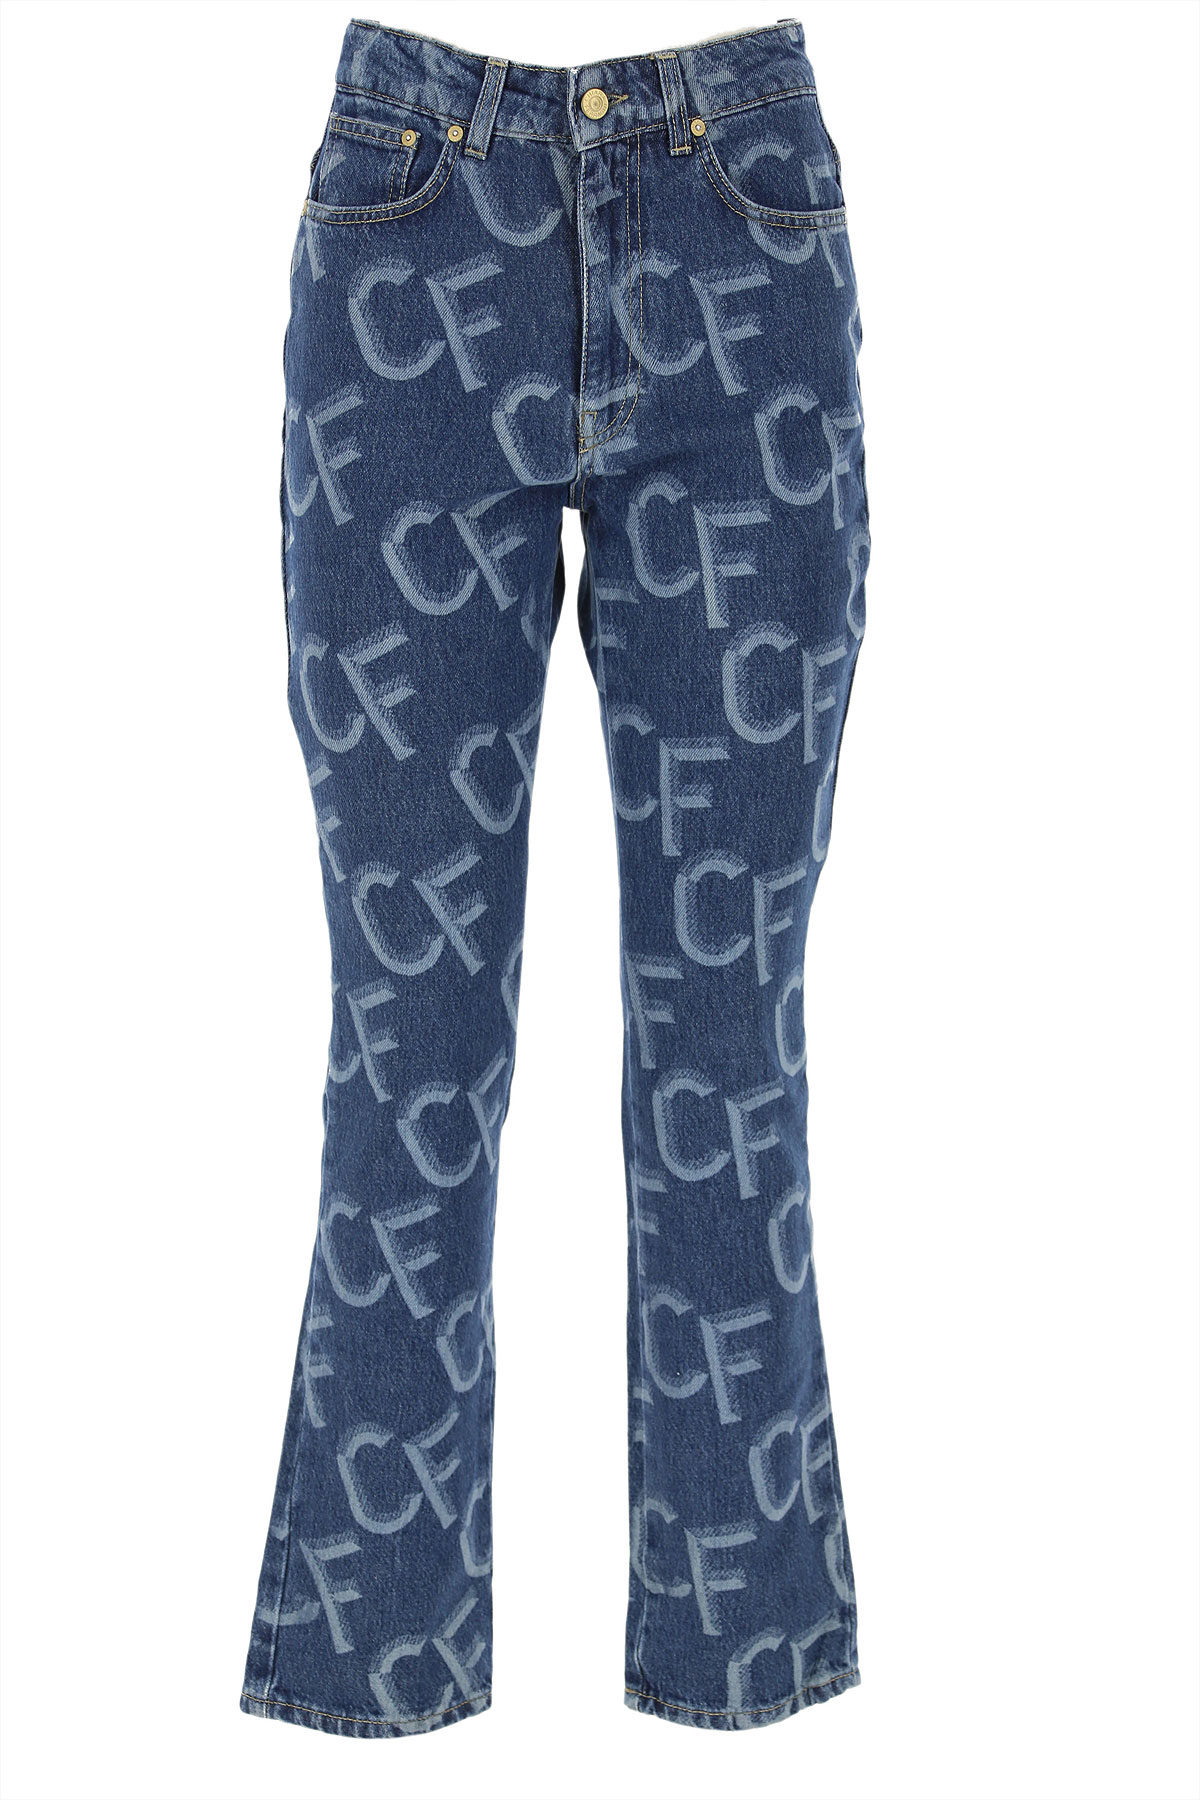 Chiara Ferragni Jeans, Denim Blue, Cotton, 2019, S (IT 40) M (IT 42 ) XS (IT 38)